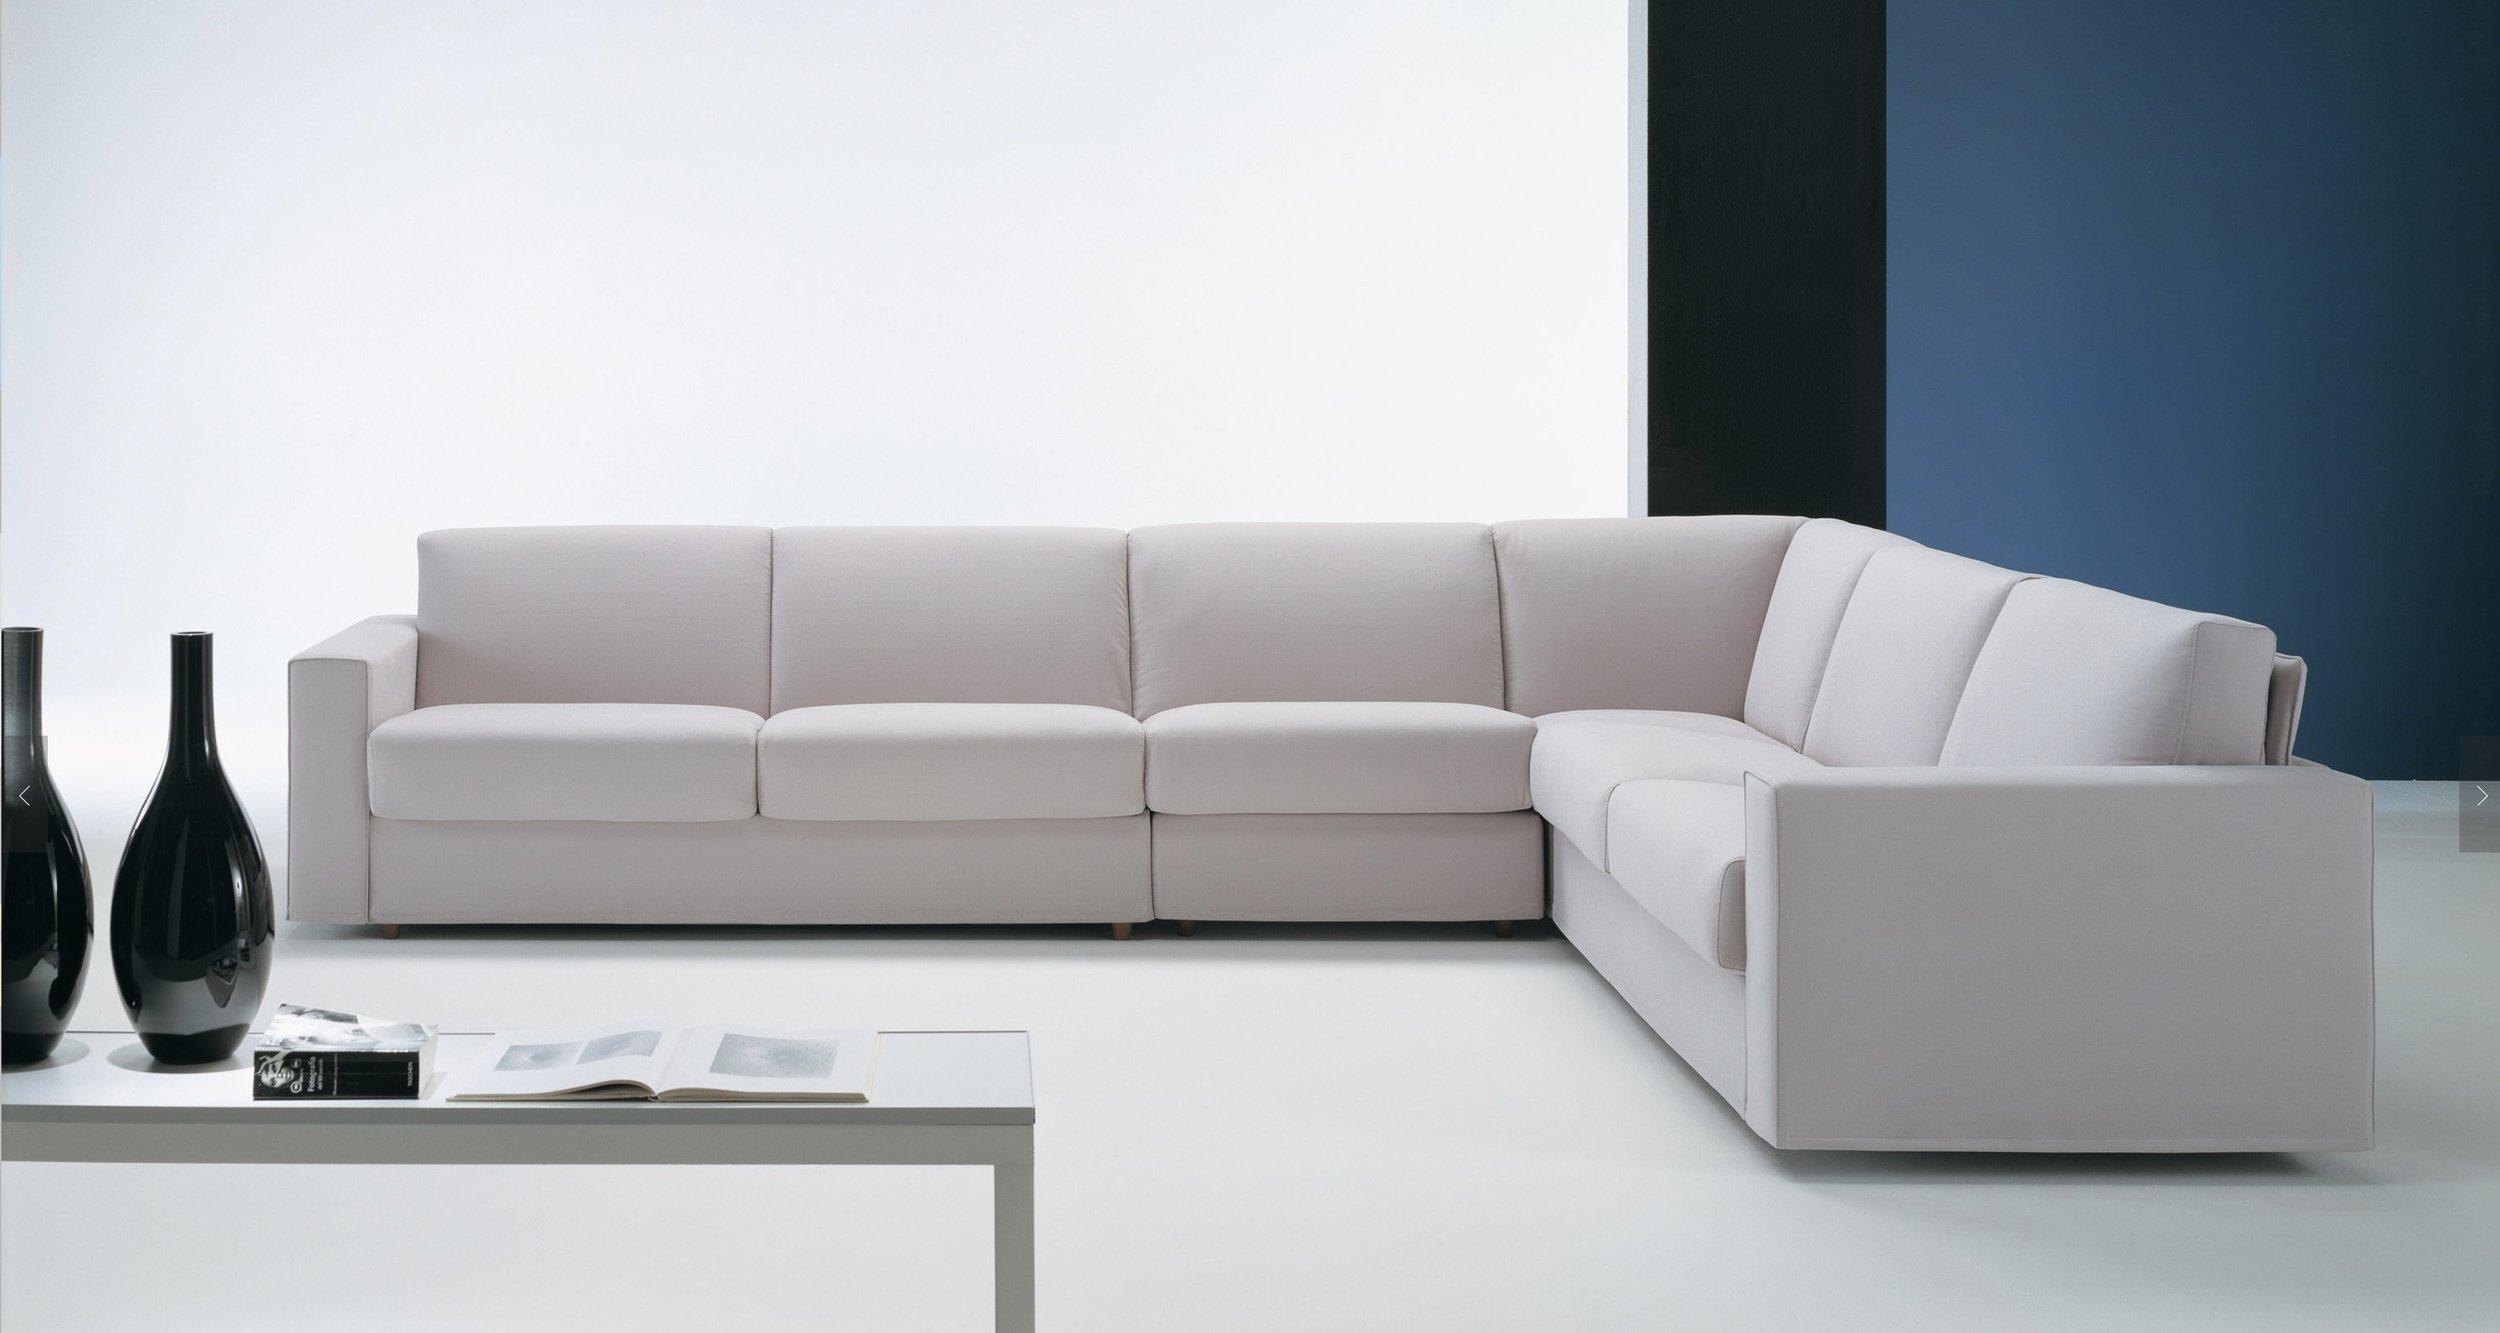 SBD 112 Modern Sofa Beds